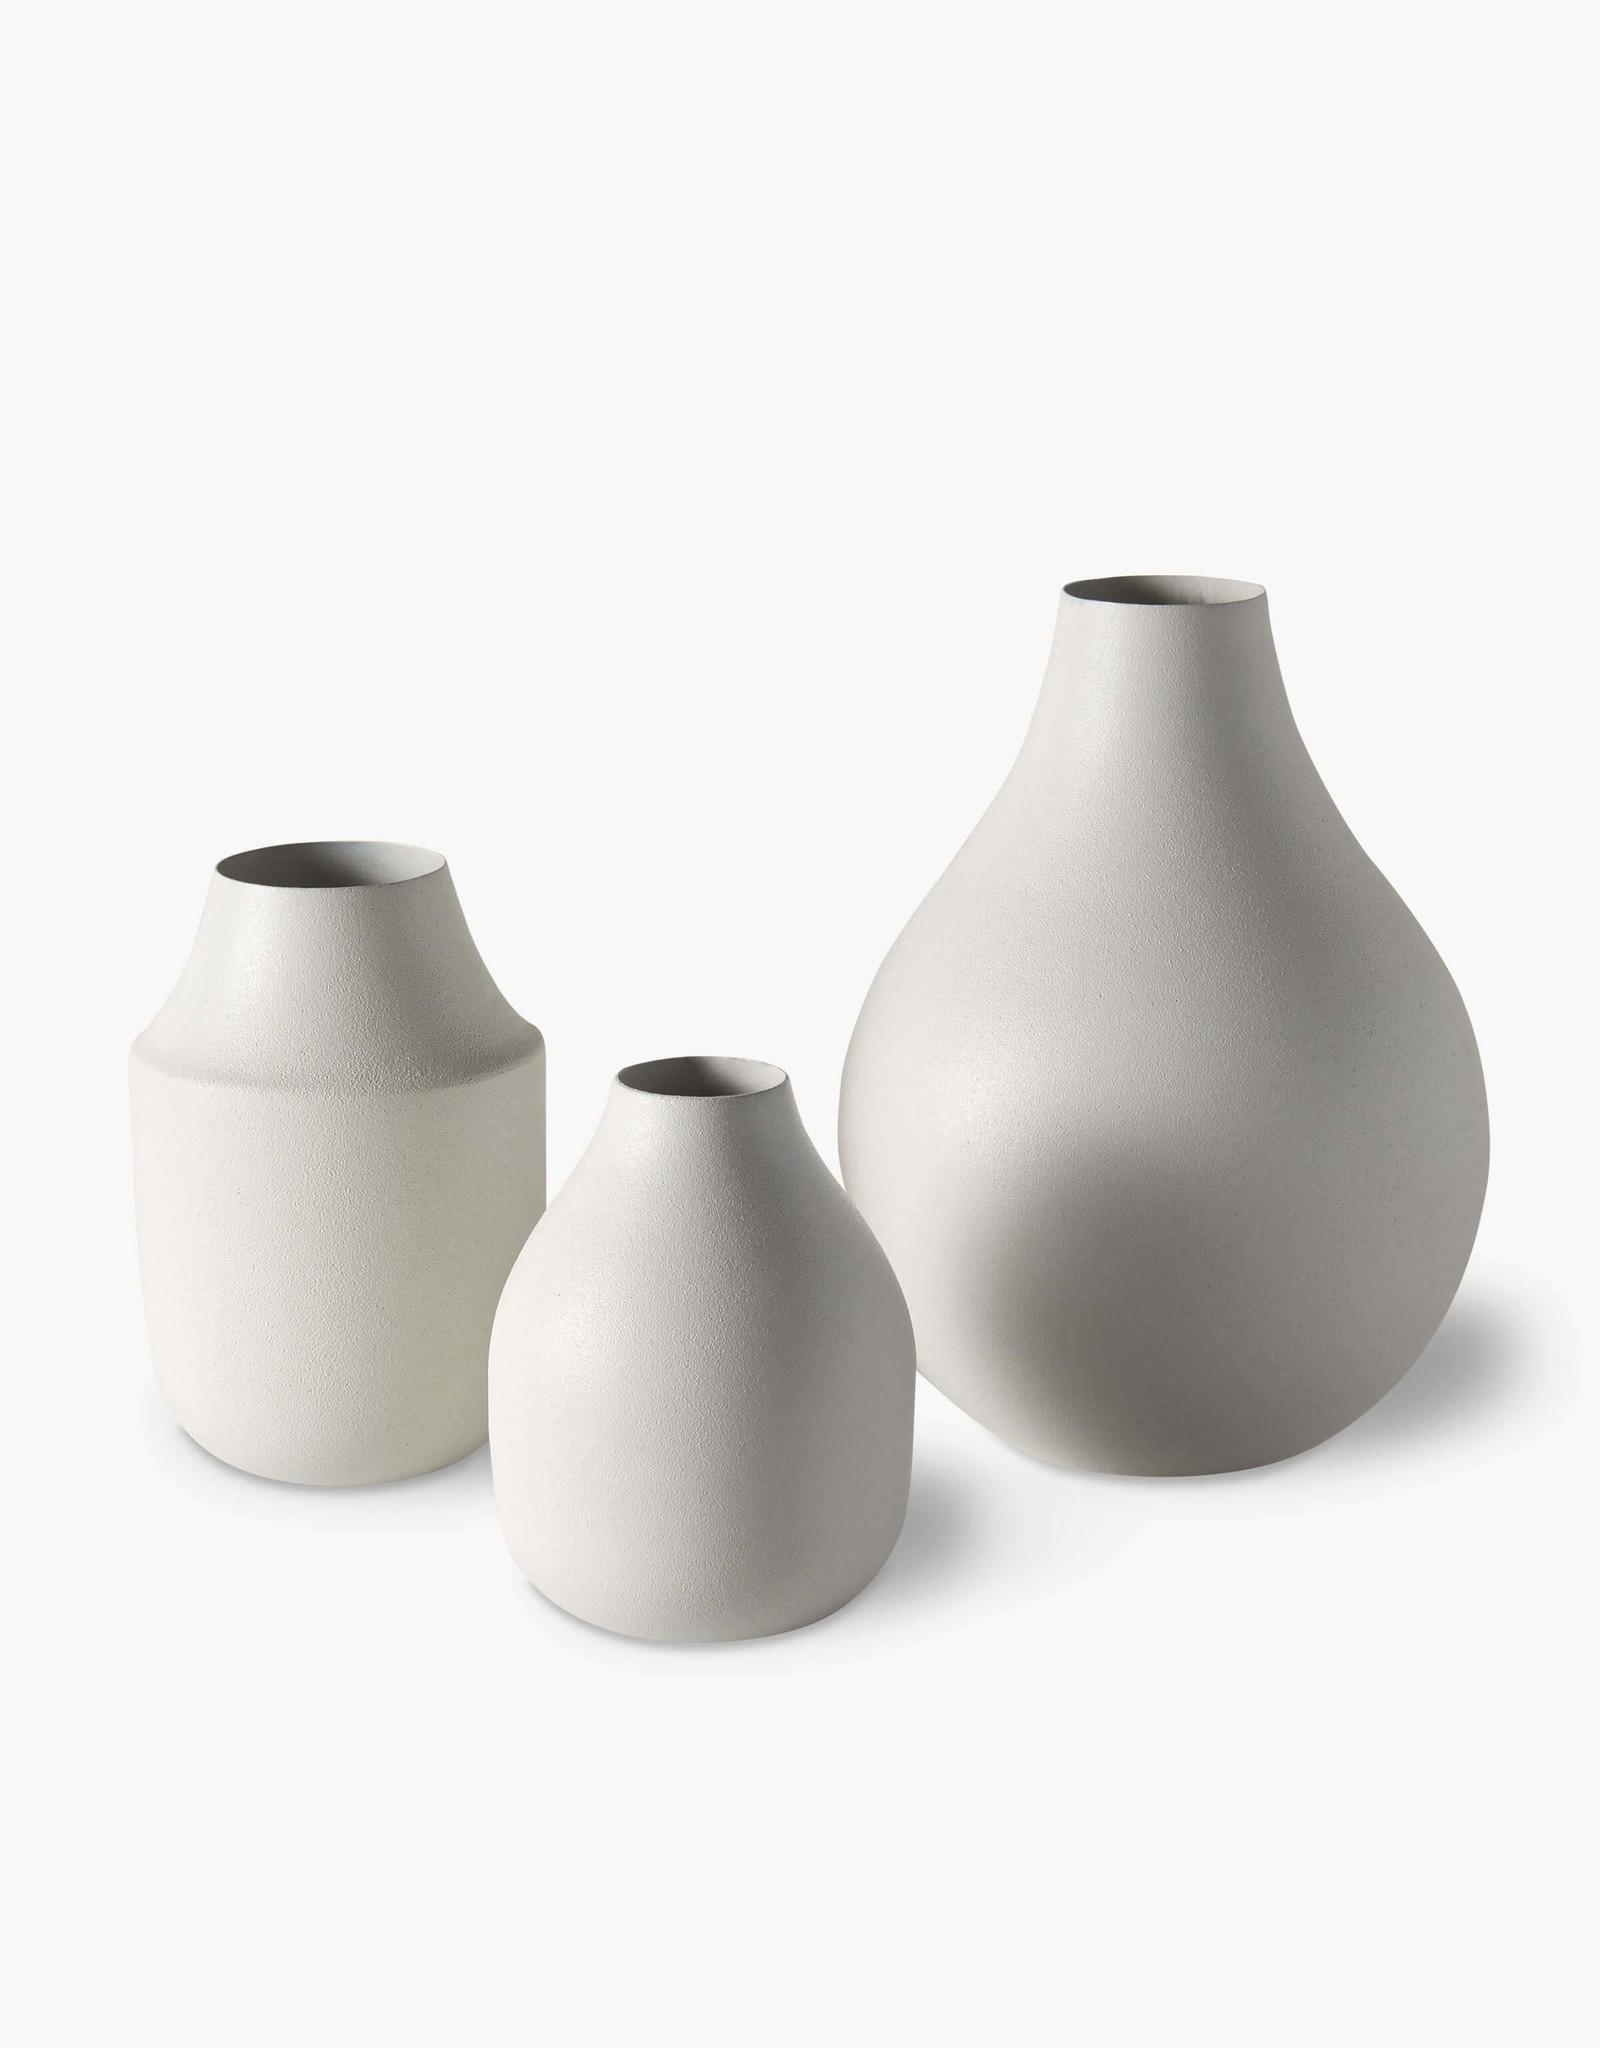 Mona trio vases - Chalk